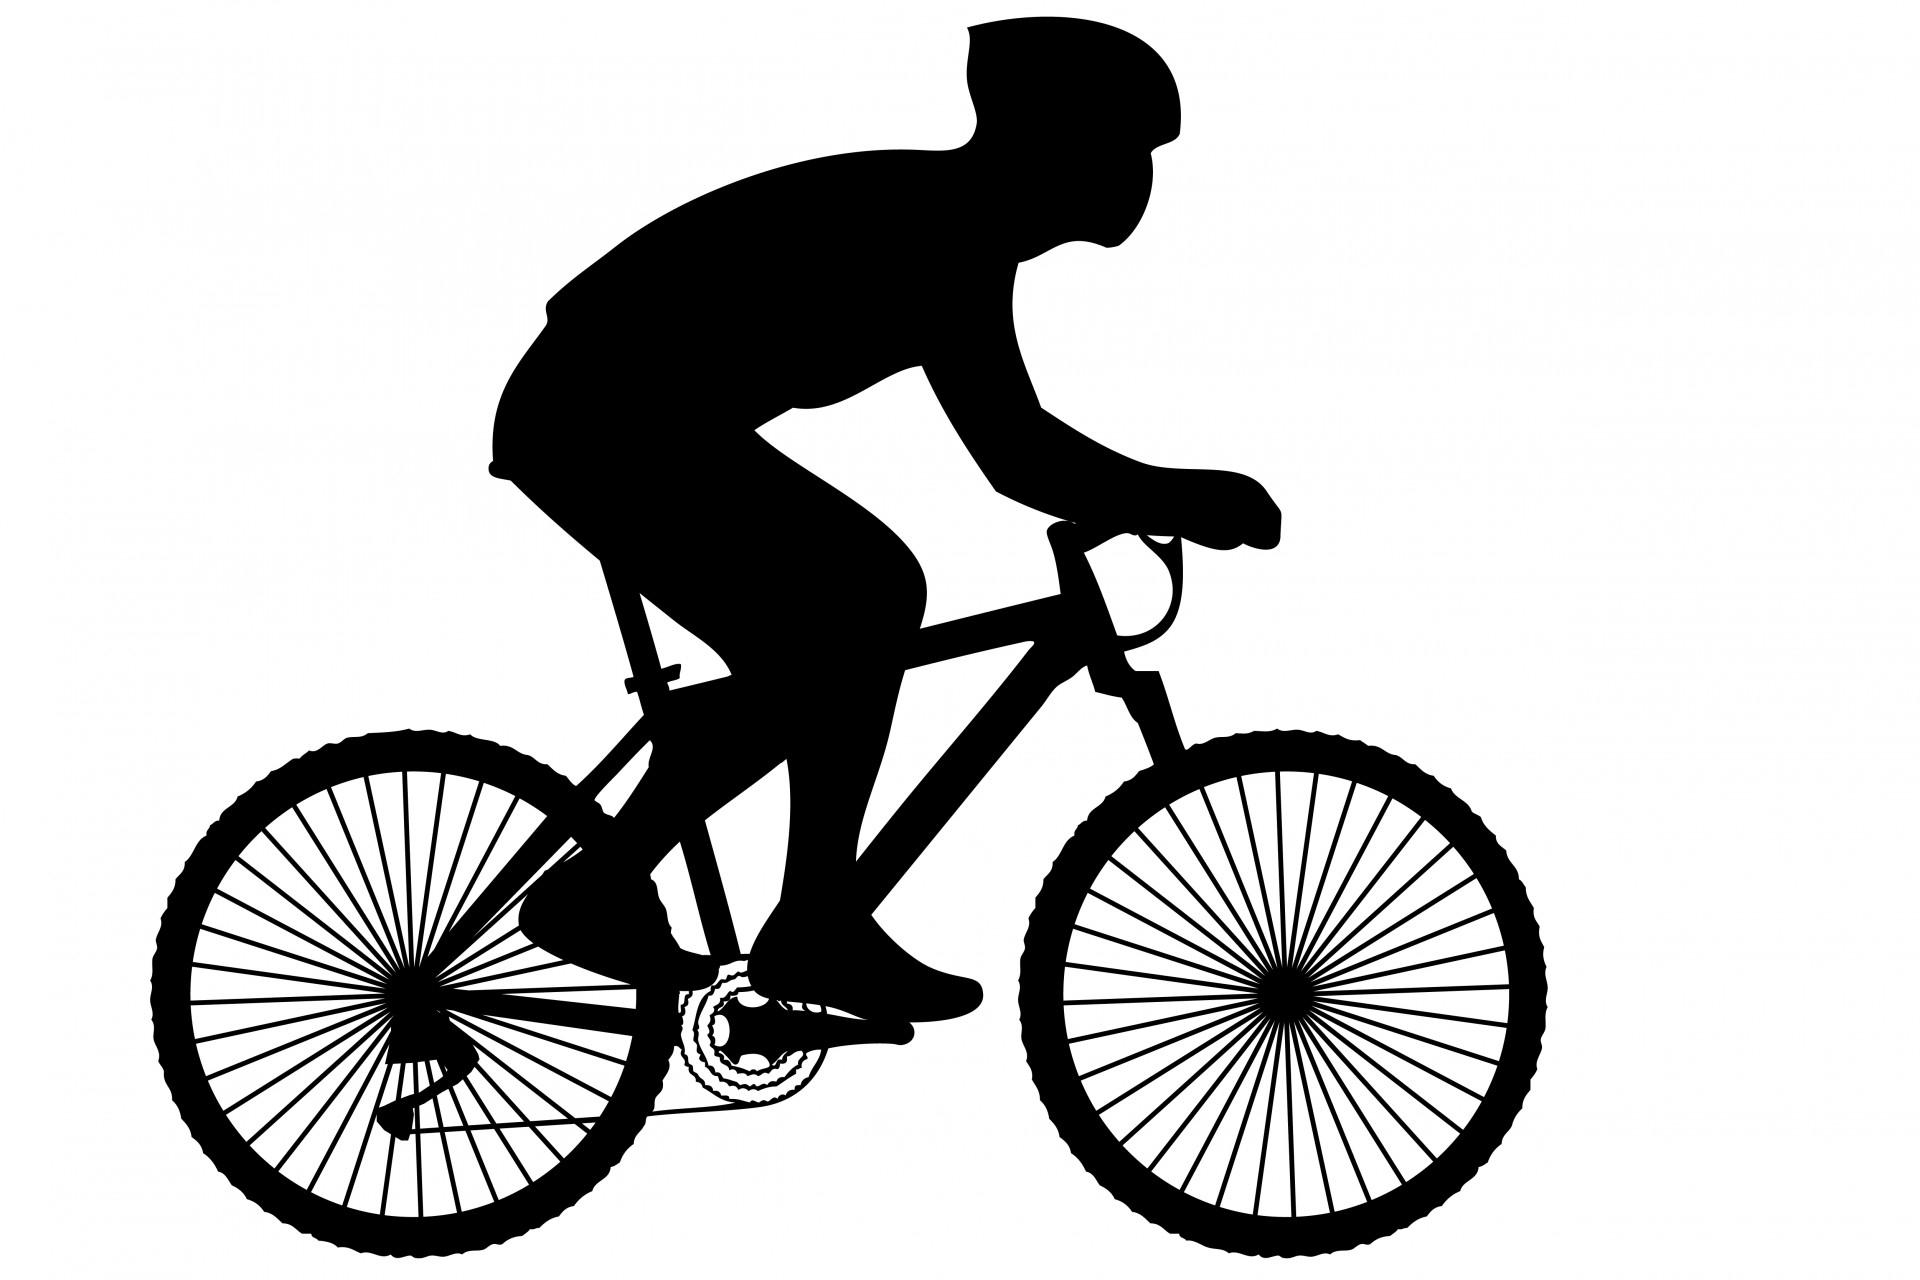 Mountain bike ride clipart black and white jpg transparent stock Free Bike Silhouette Clip Art, Download Free Clip Art, Free ... jpg transparent stock